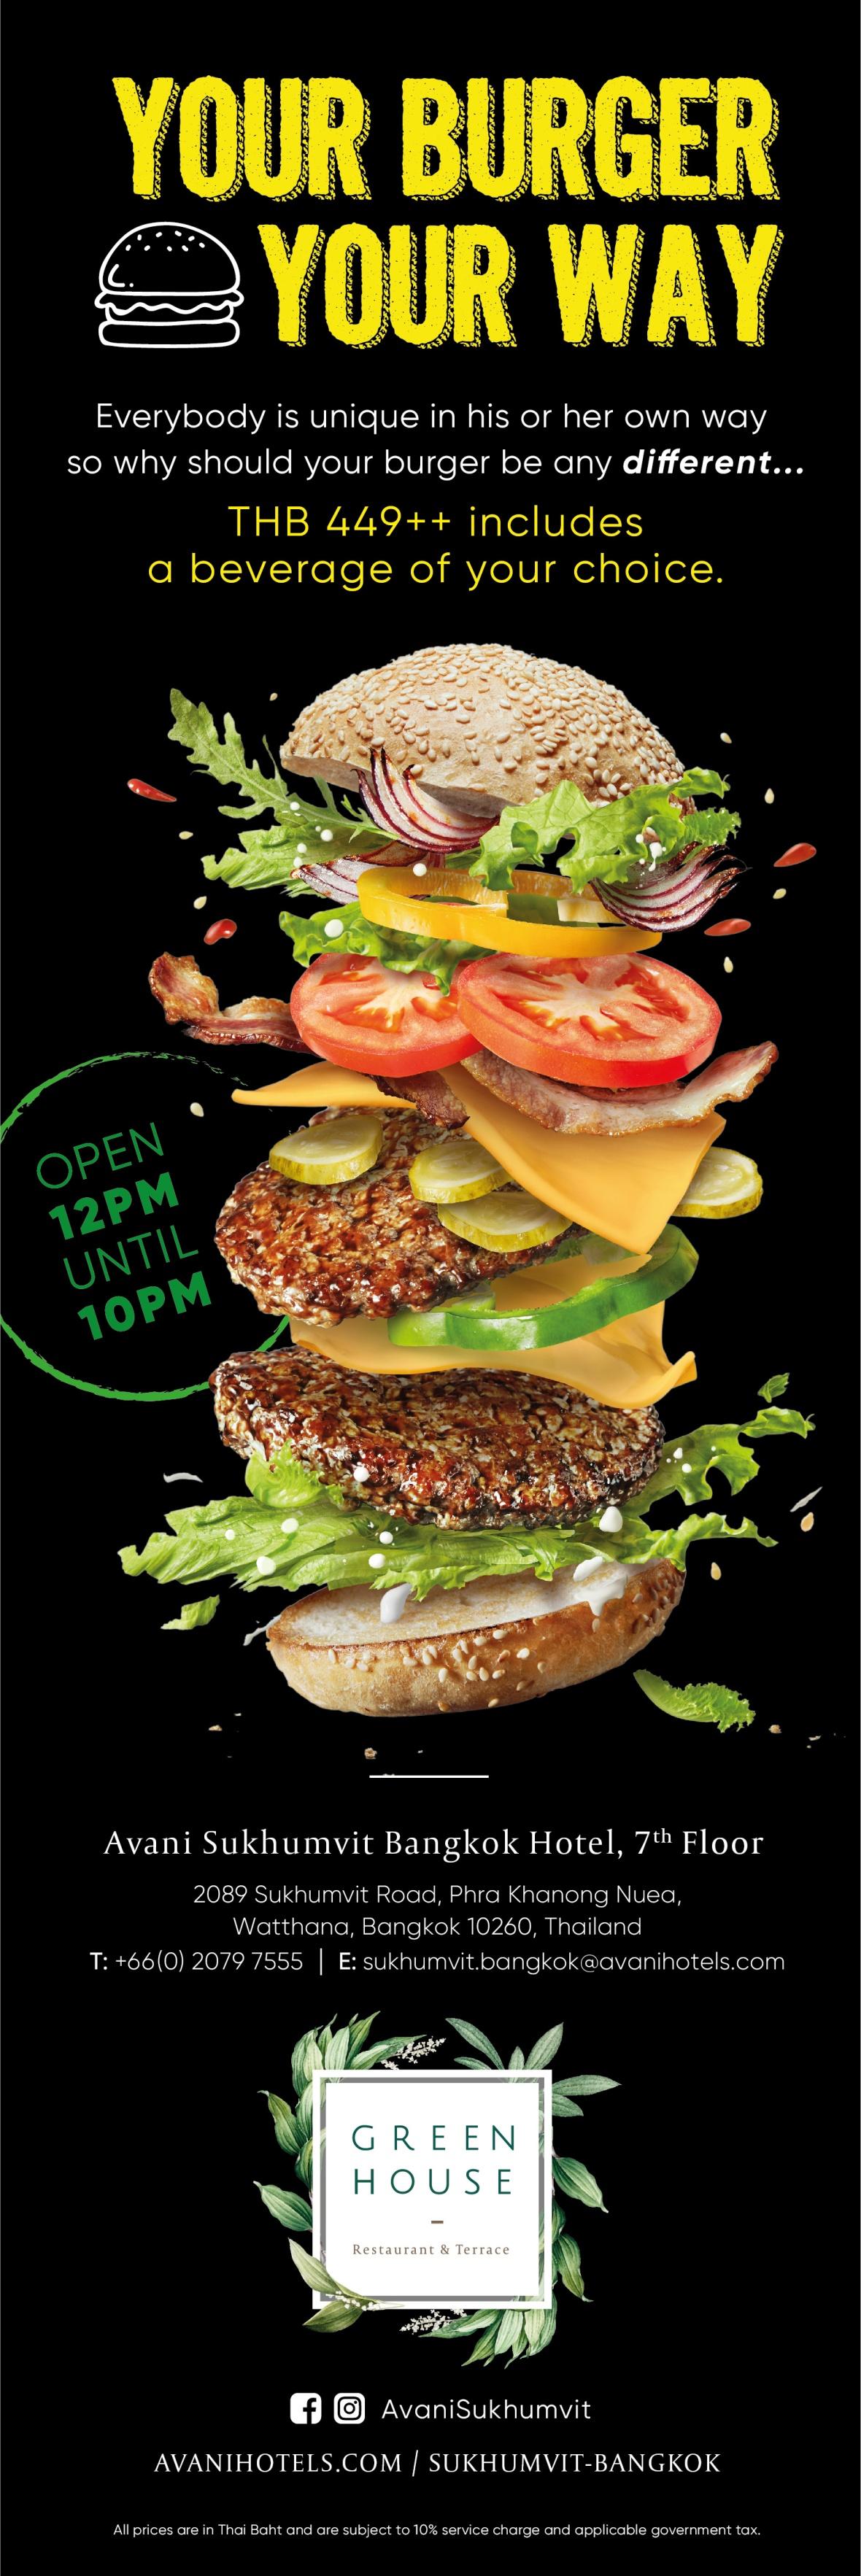 AvaniSukhumvit_BurgerPromotion